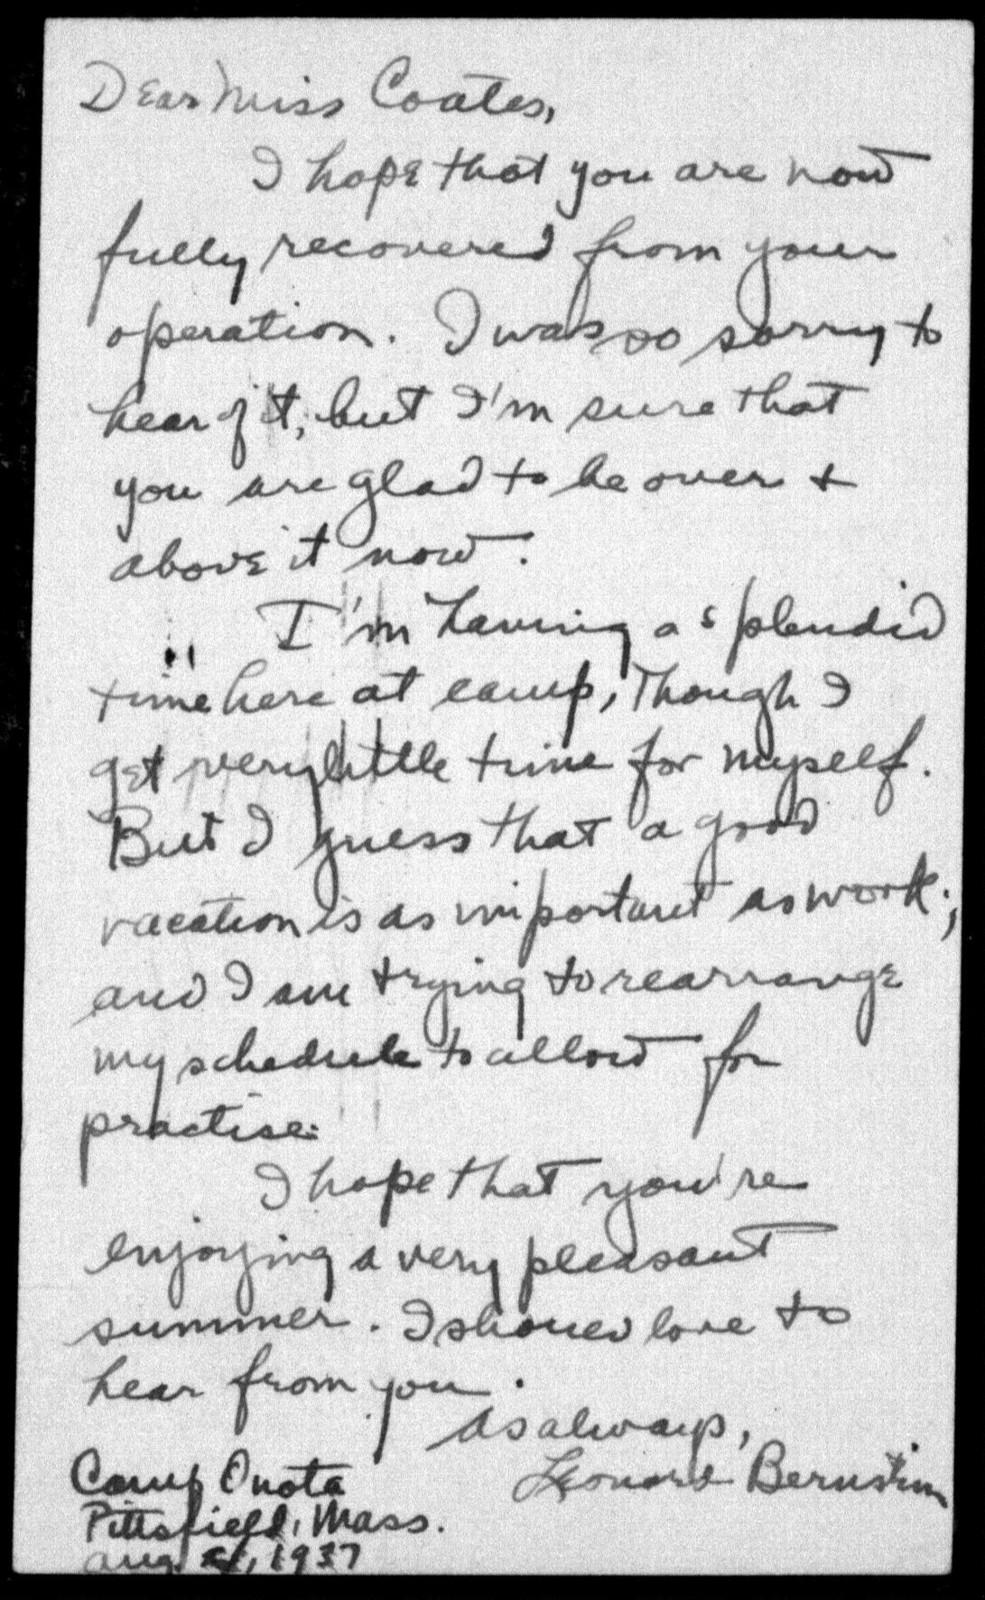 Letter from Leonard Bernstein to Helen Coates, August 1937